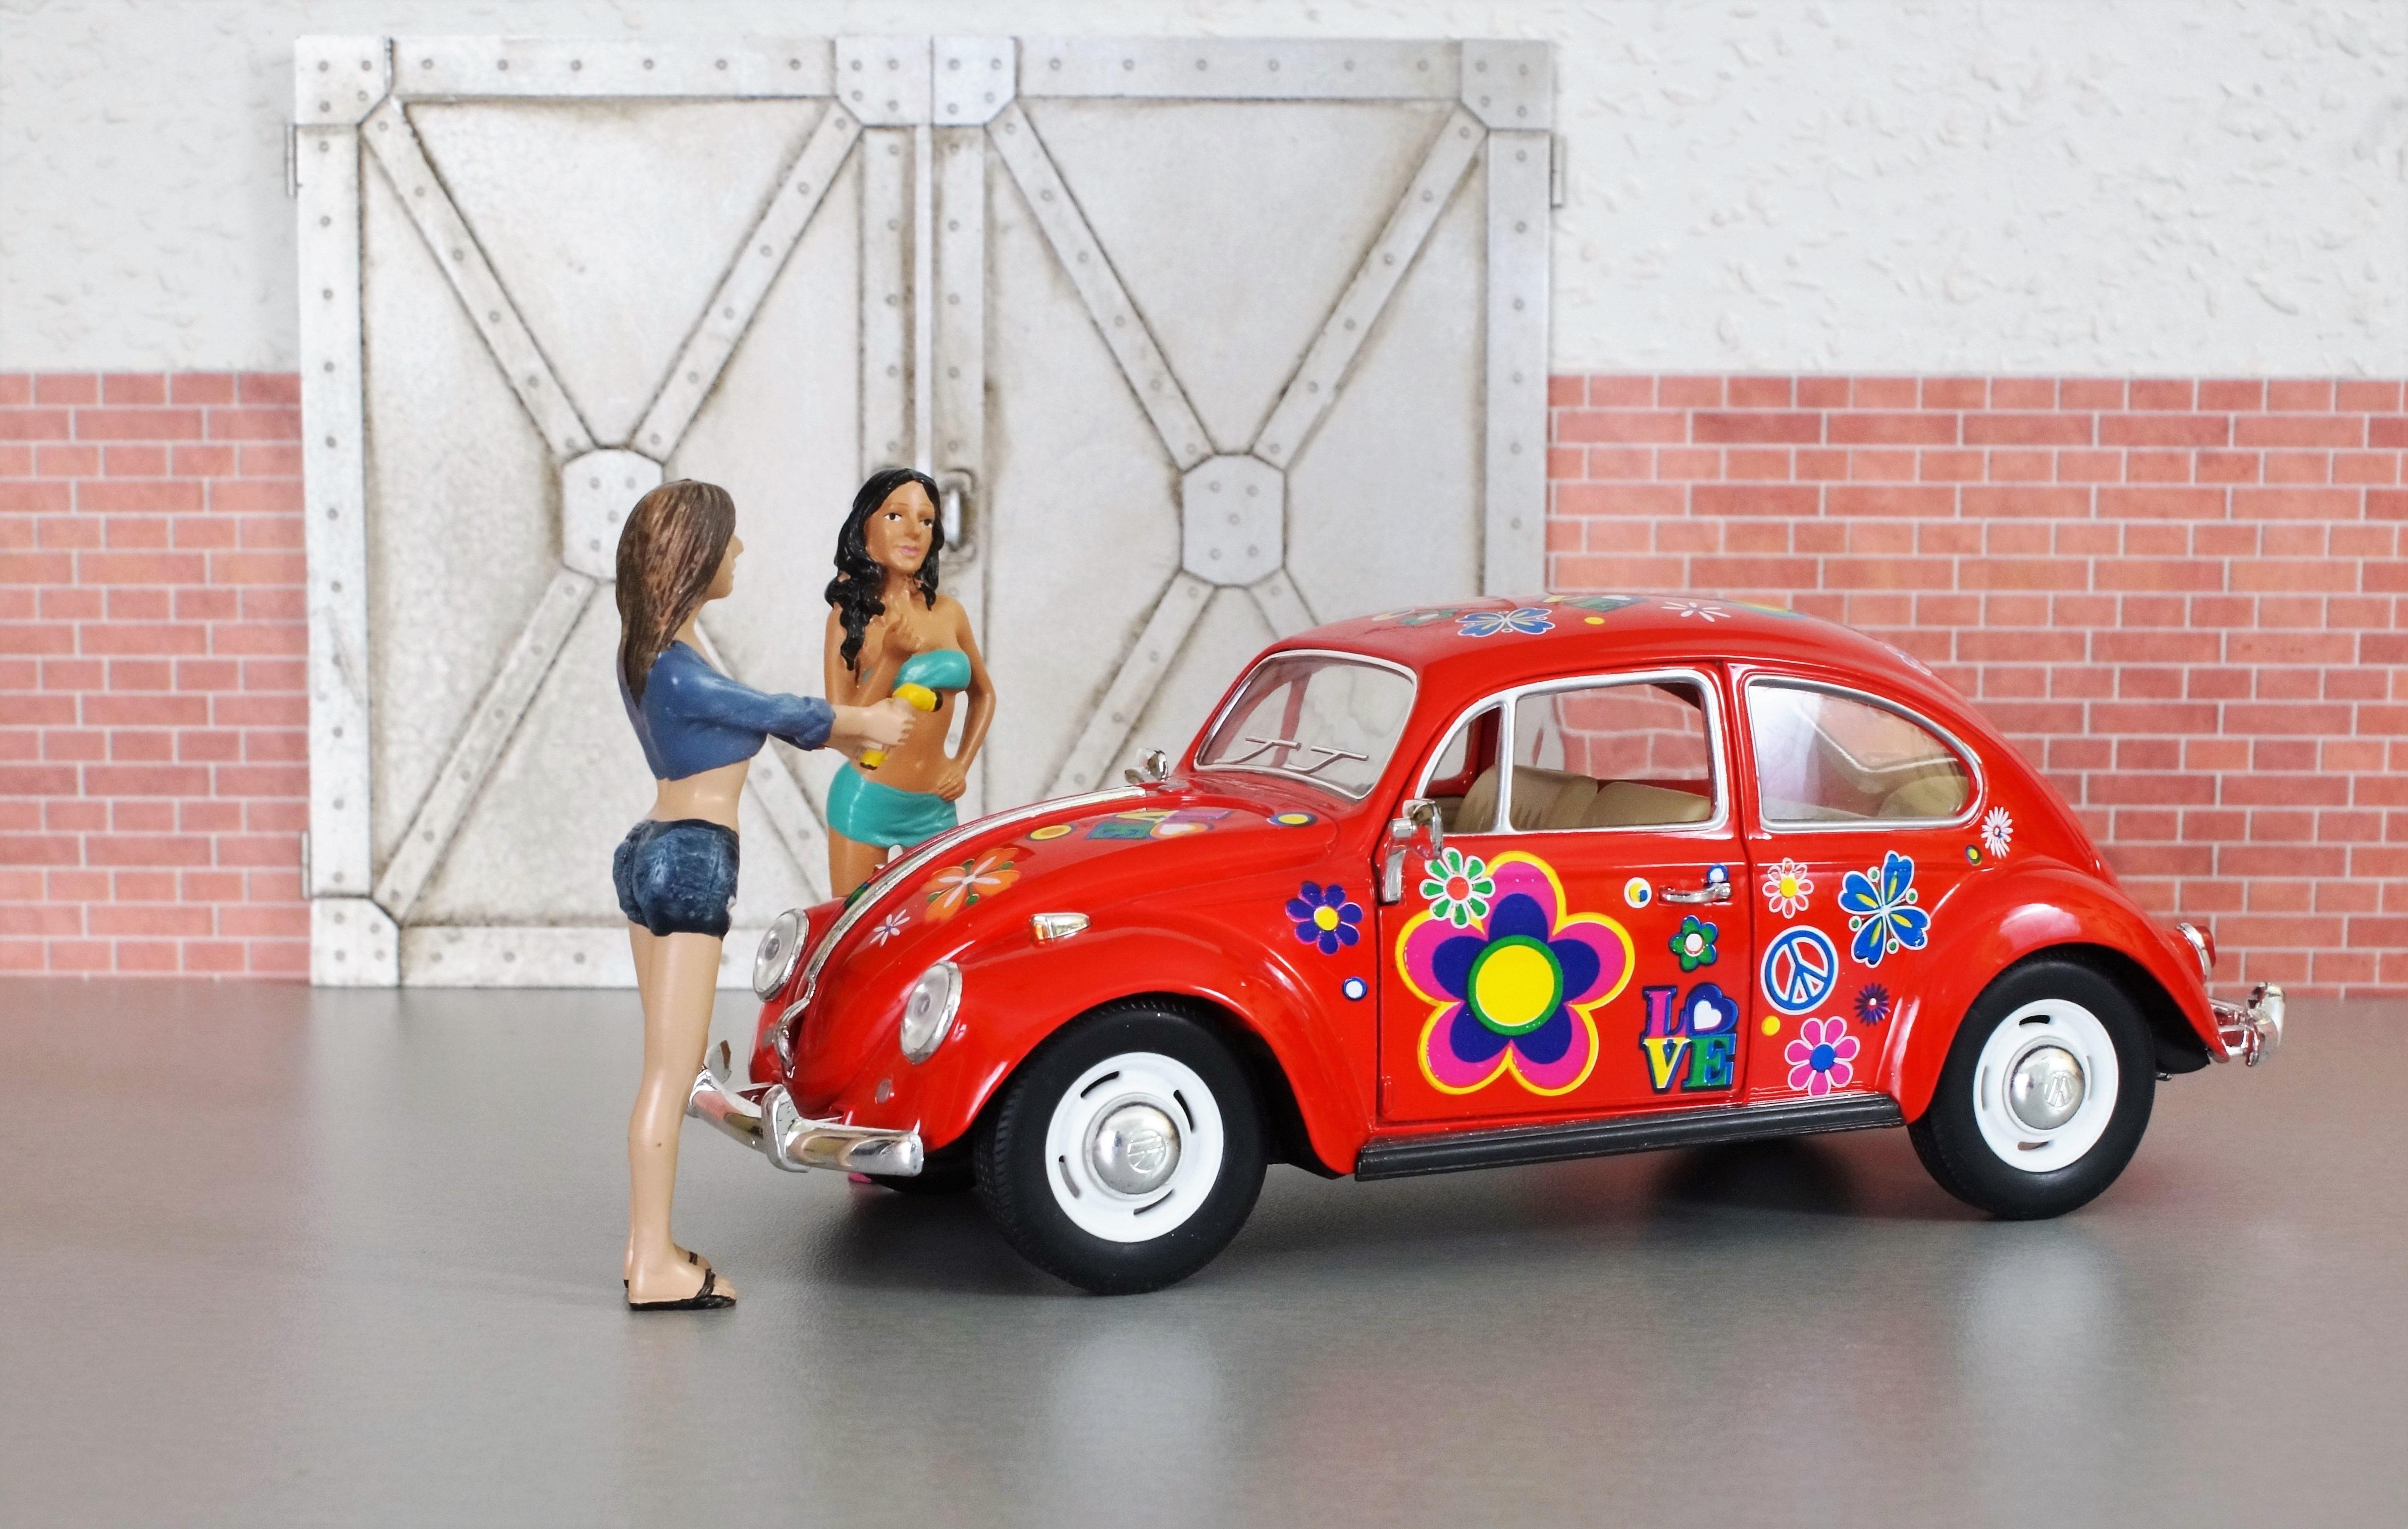 Free Images : beach, woman, vw, auto, toy, old car, bikini ...